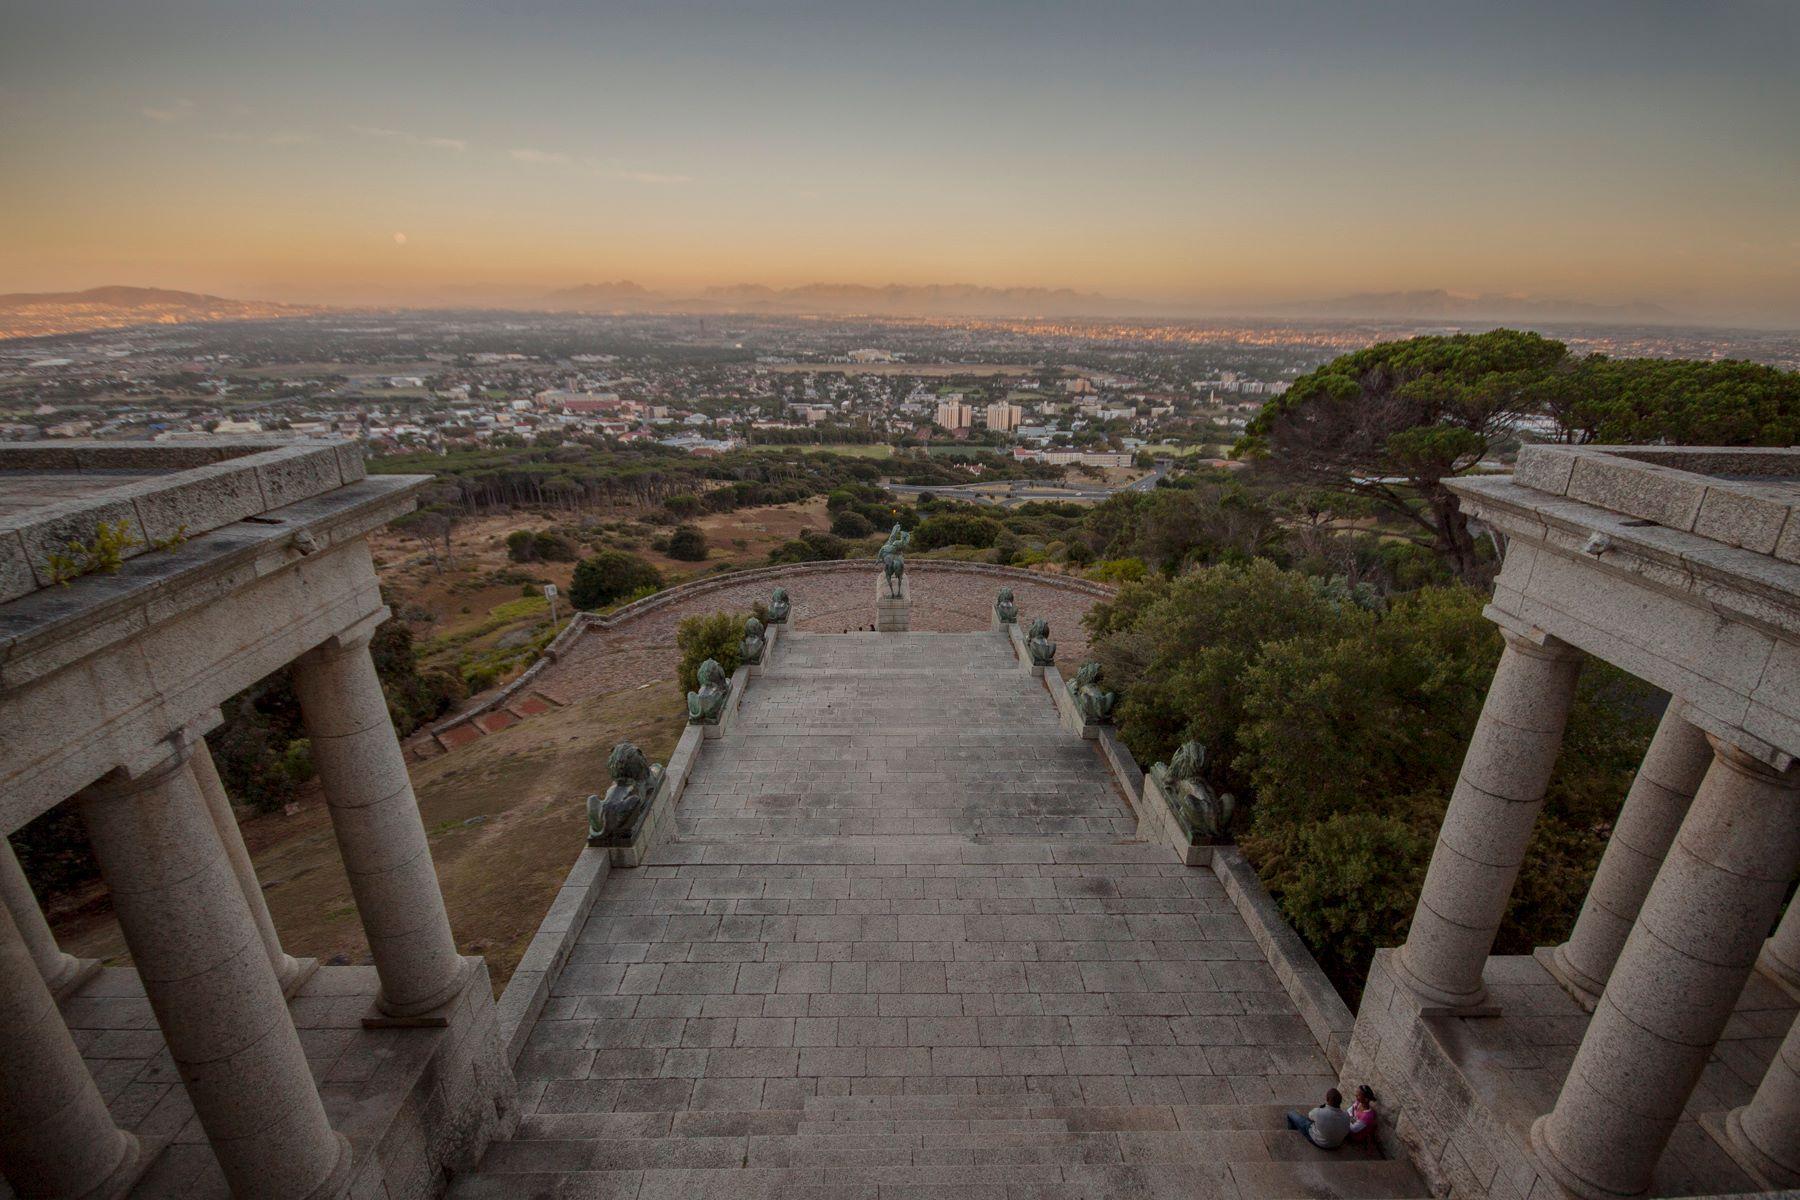 rhodes-memorial-view